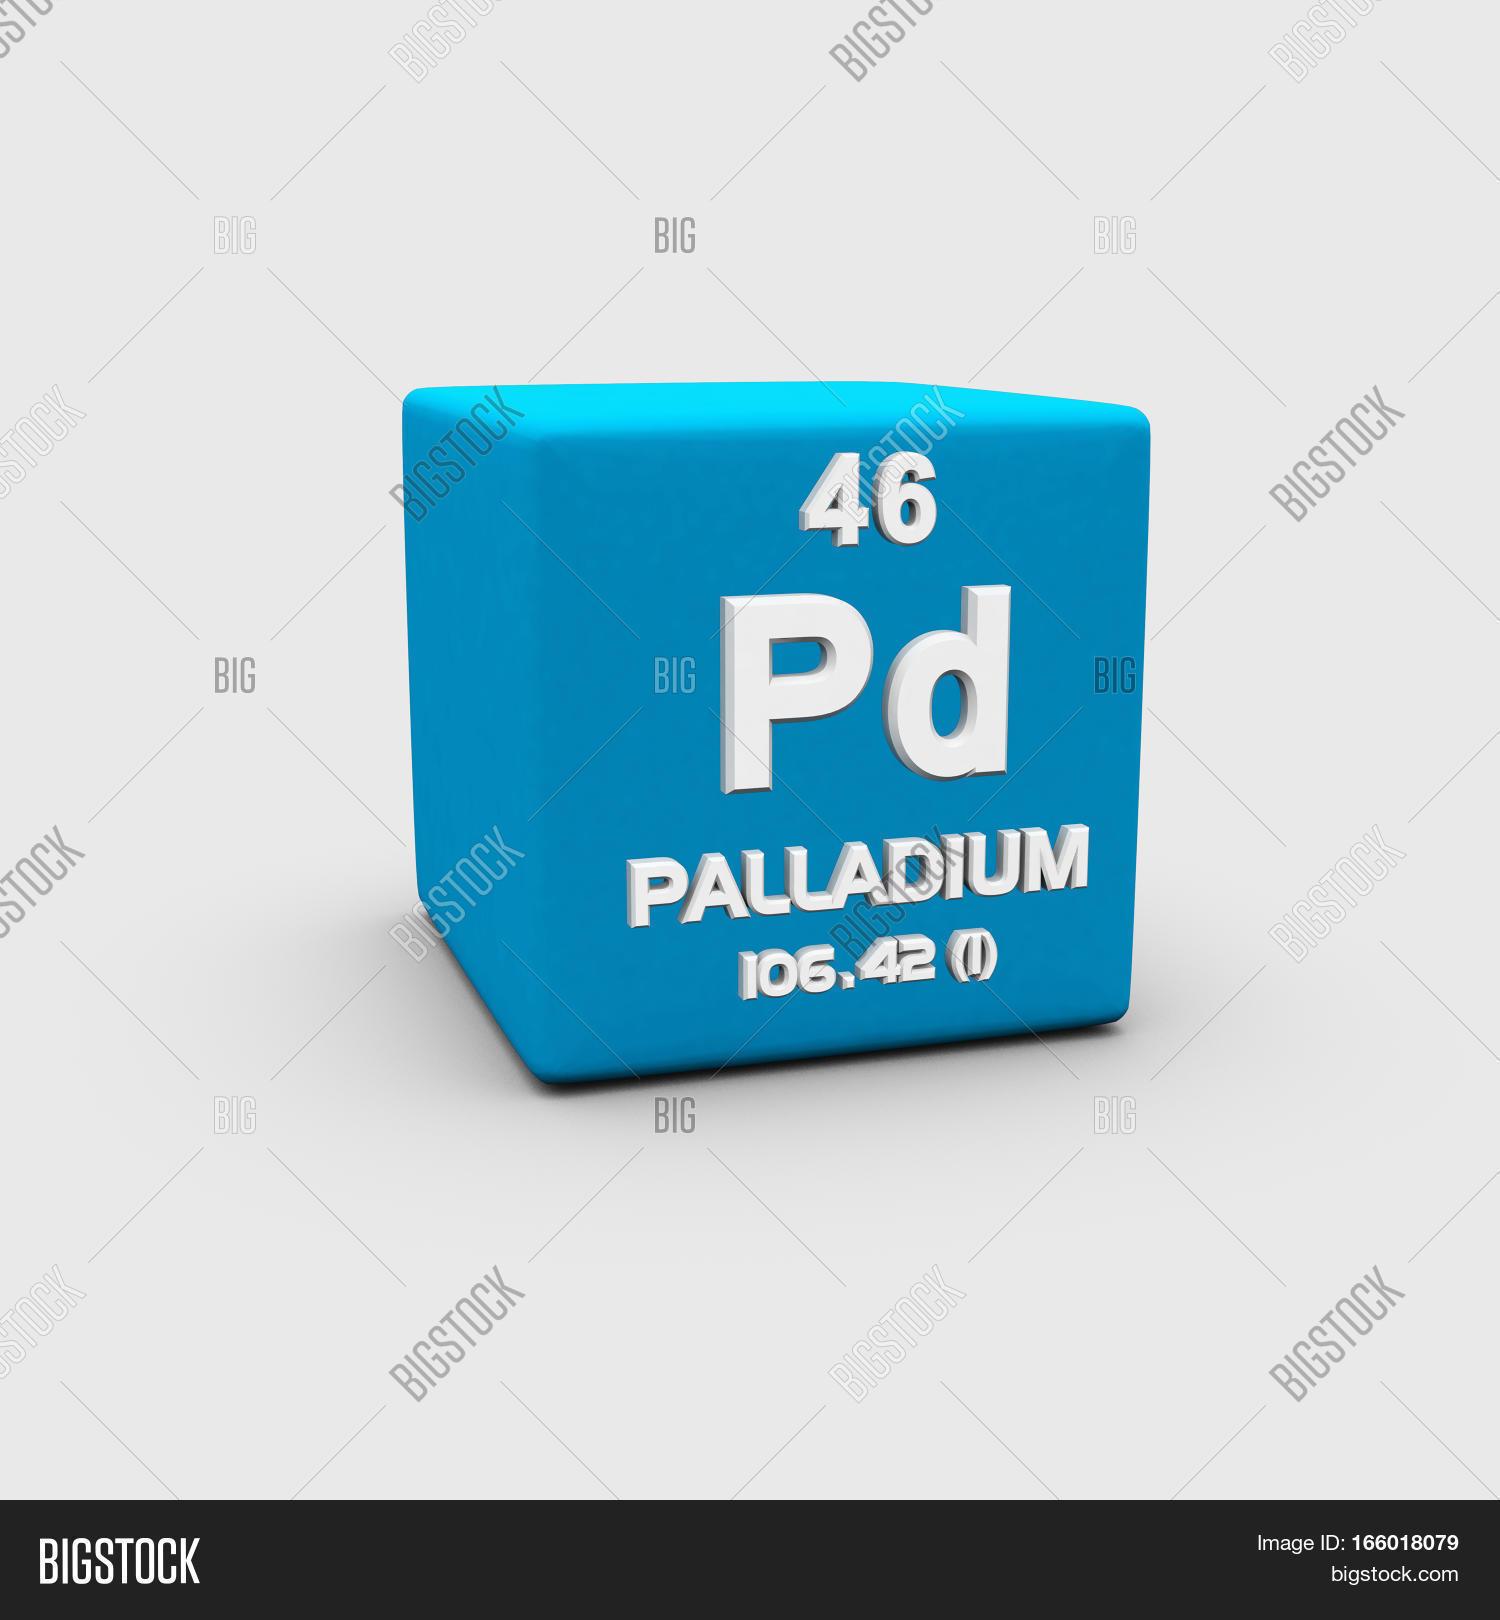 Palladium Chemical Image Photo Free Trial Bigstock